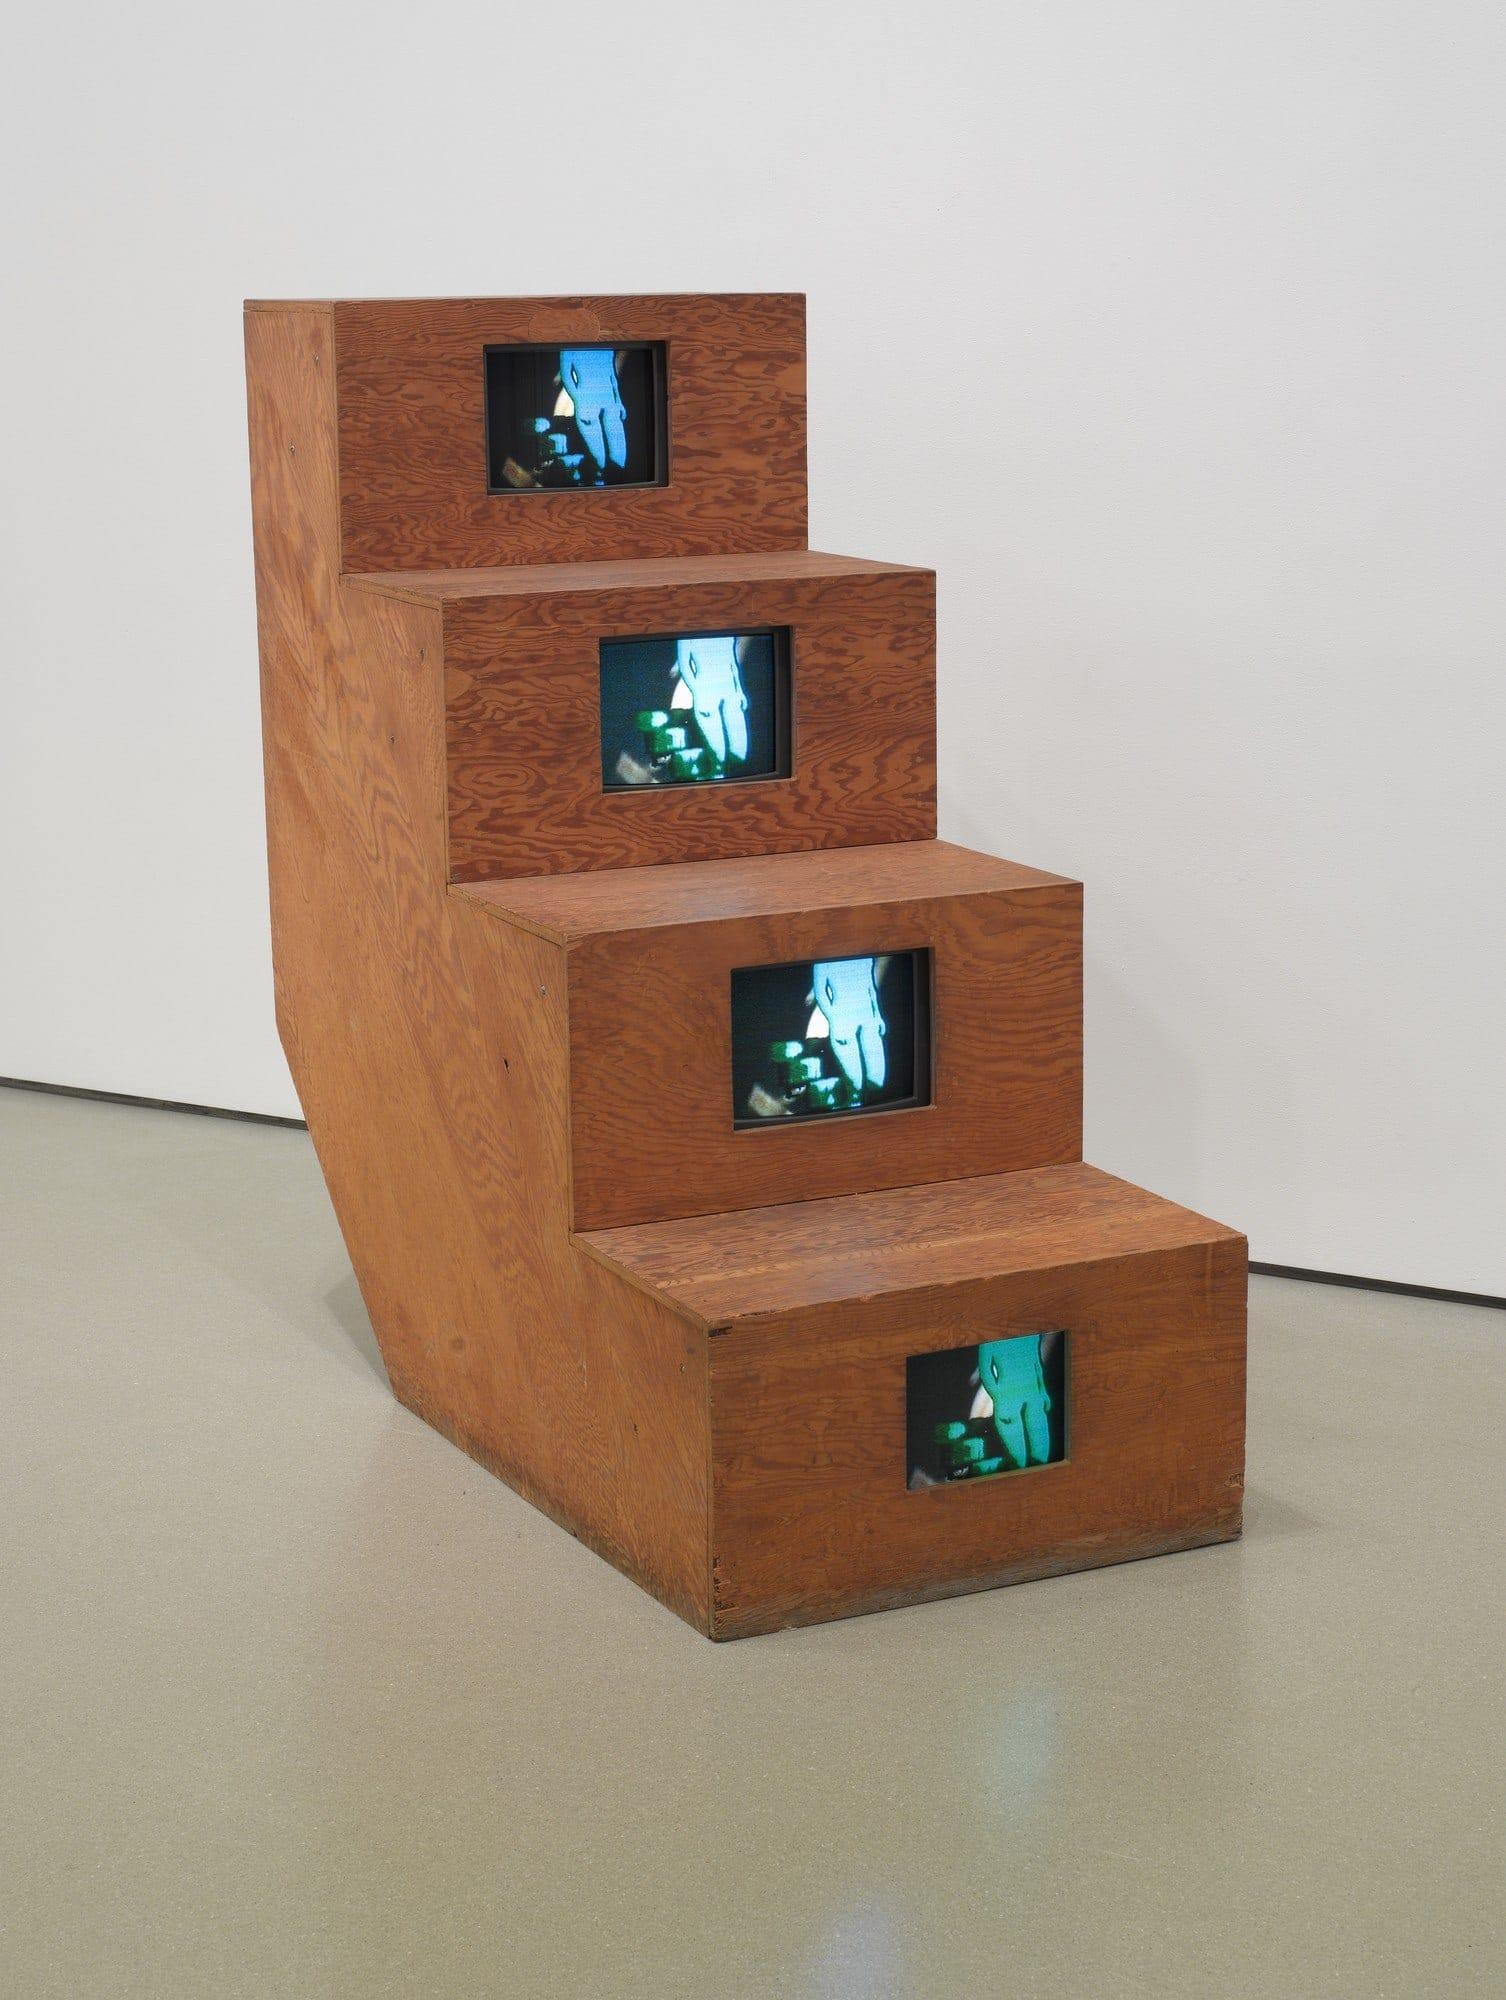 Digital Art - Nude Descending a Staircase